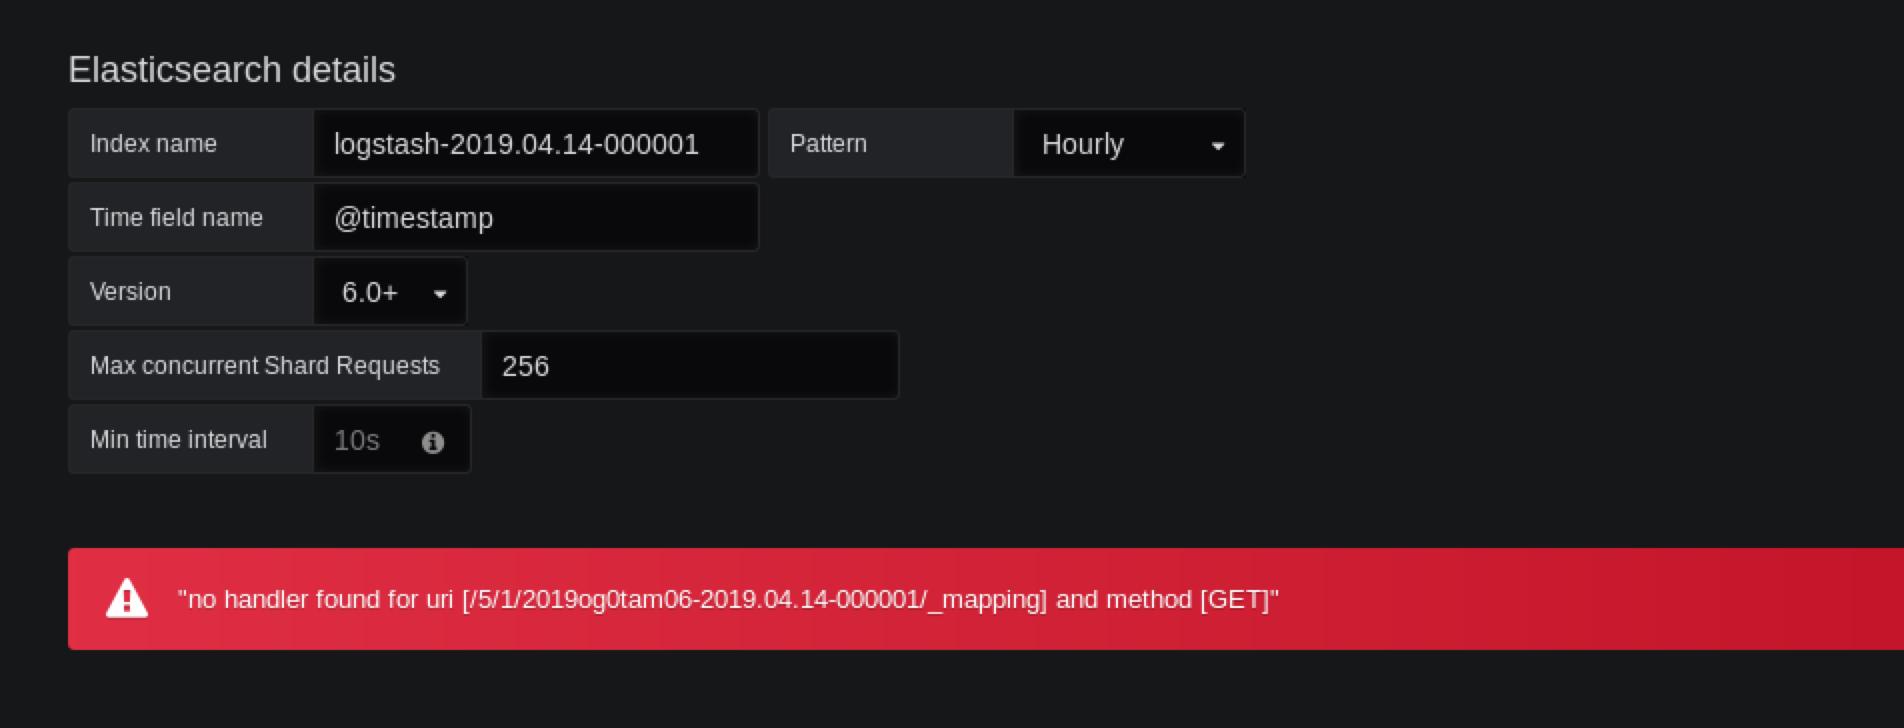 Elasticsearch 7 x support · Issue #15622 · grafana/grafana